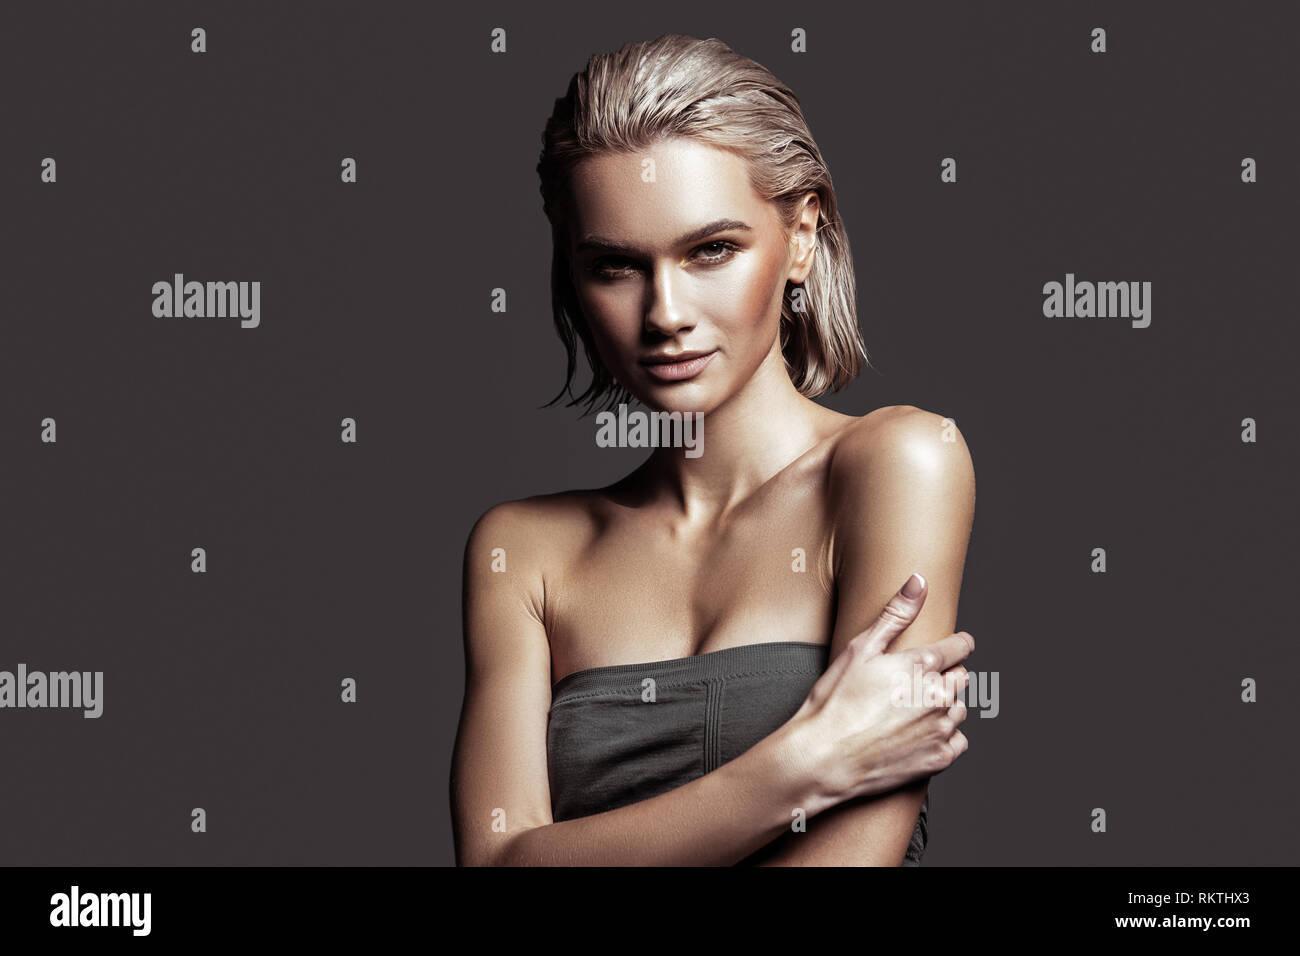 Hermosa joven modelo con maquillaje natural agradable posando Foto de stock